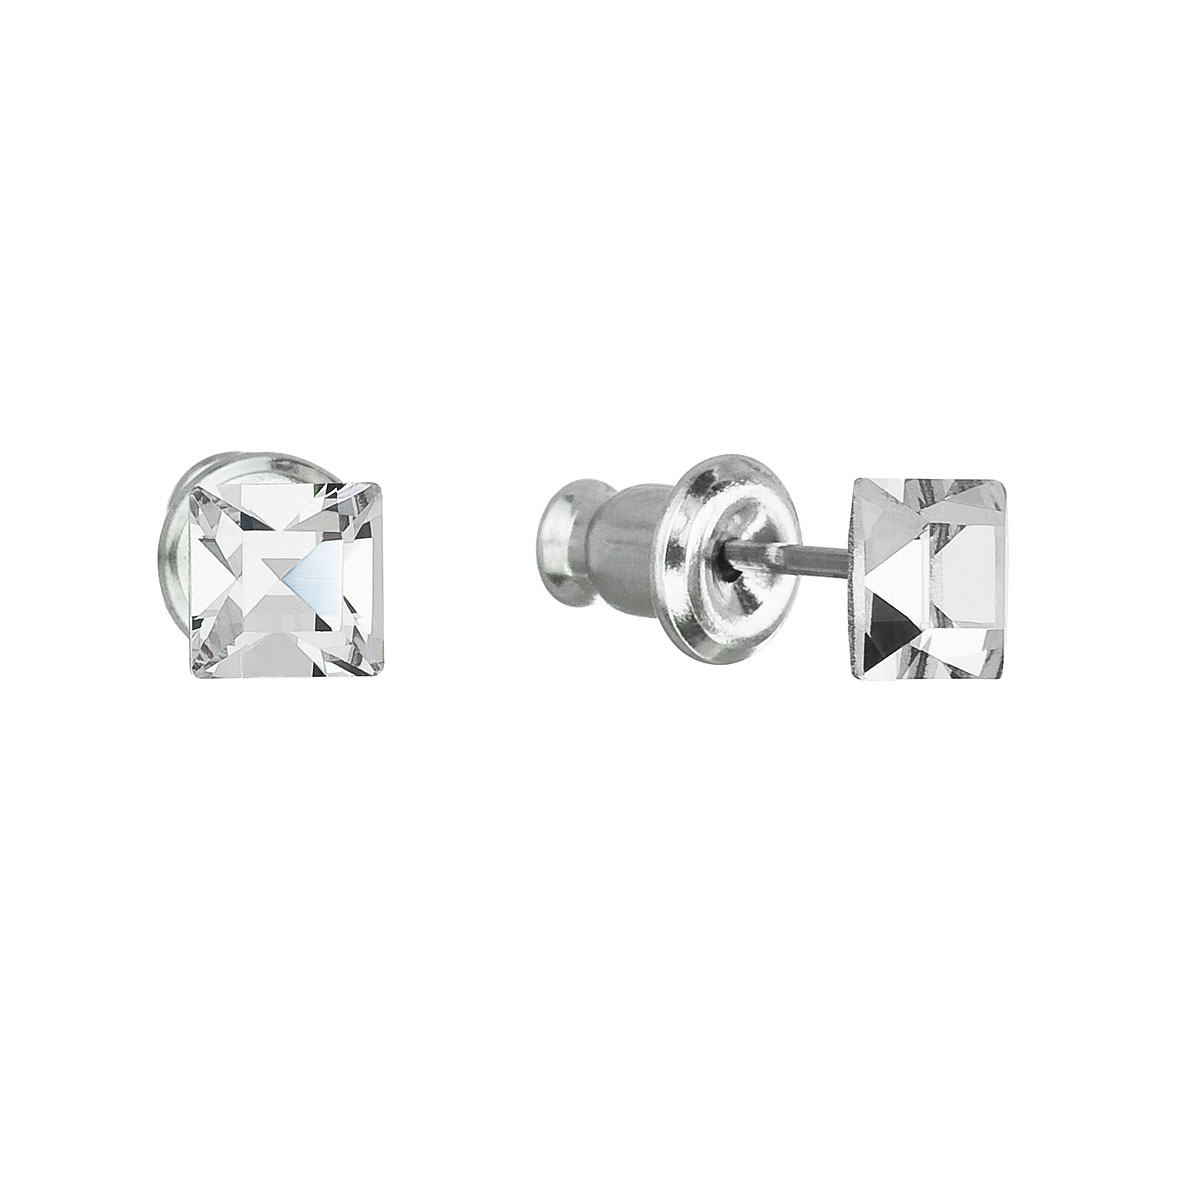 Evolution Group Náušnice bižuterie se Swarovski krystaly bílá čtverec 51052.1